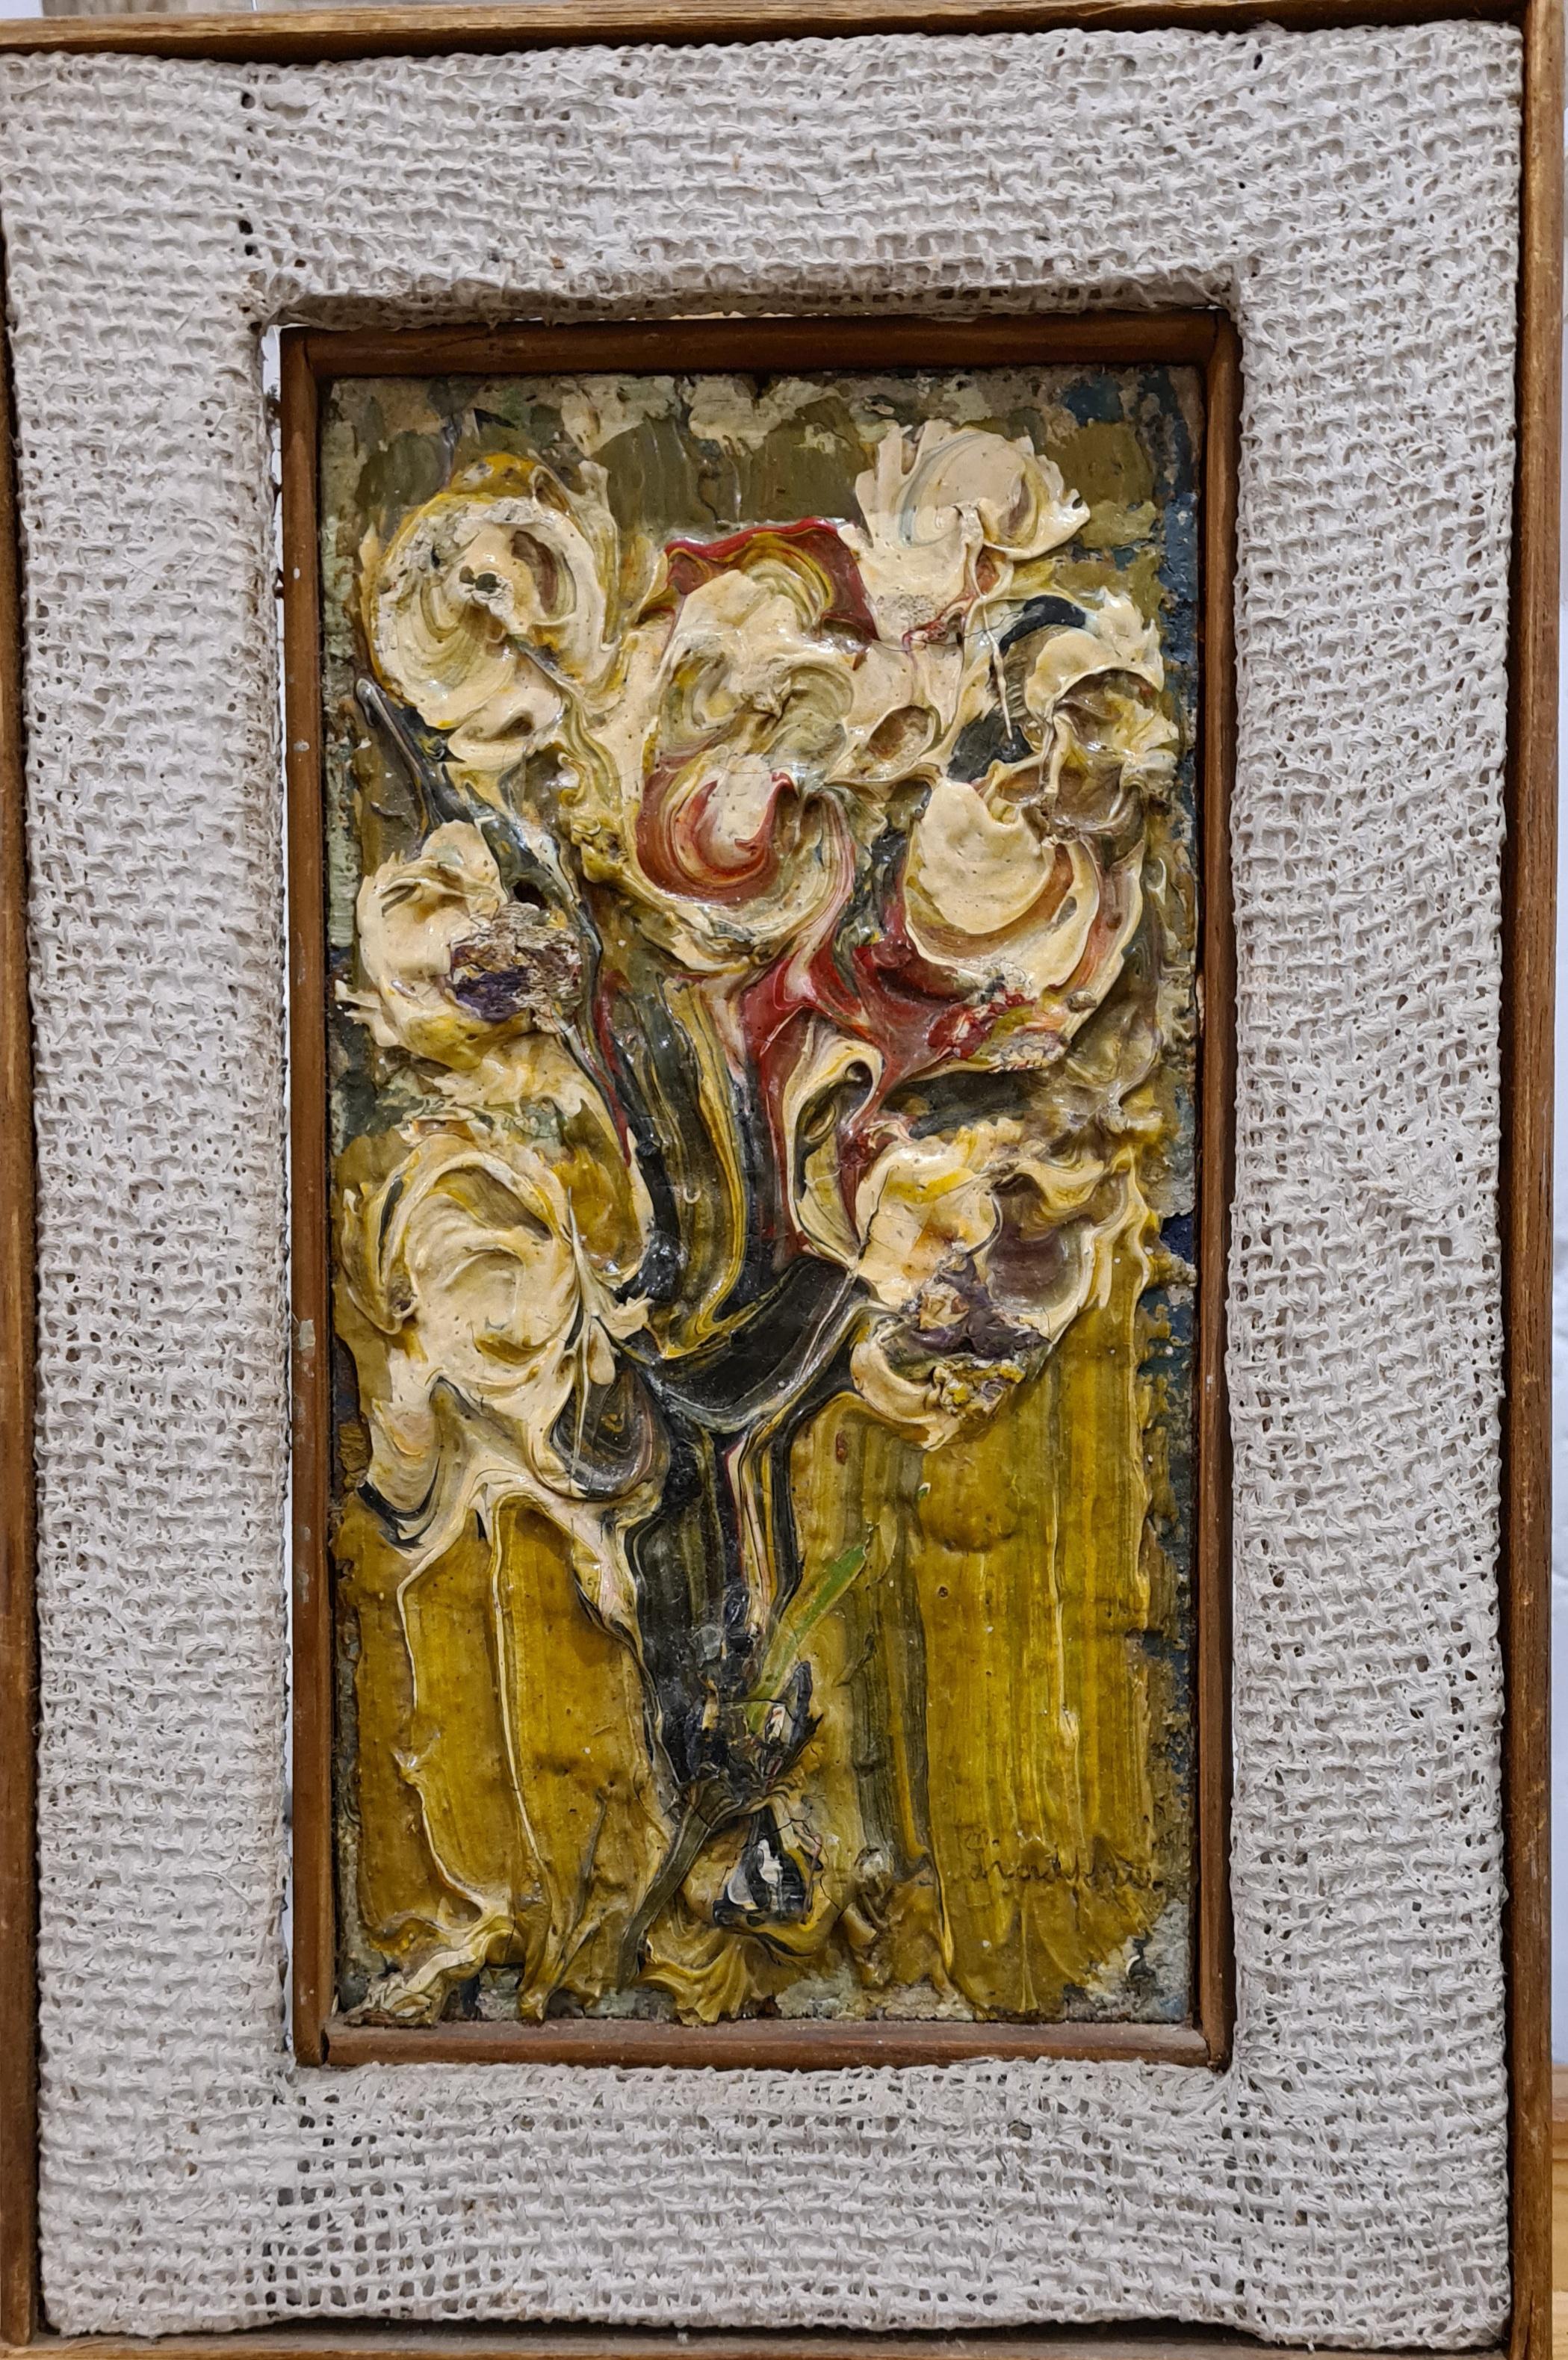 Flowers in a Vase, Scandinavian sculpture painting, mid century.